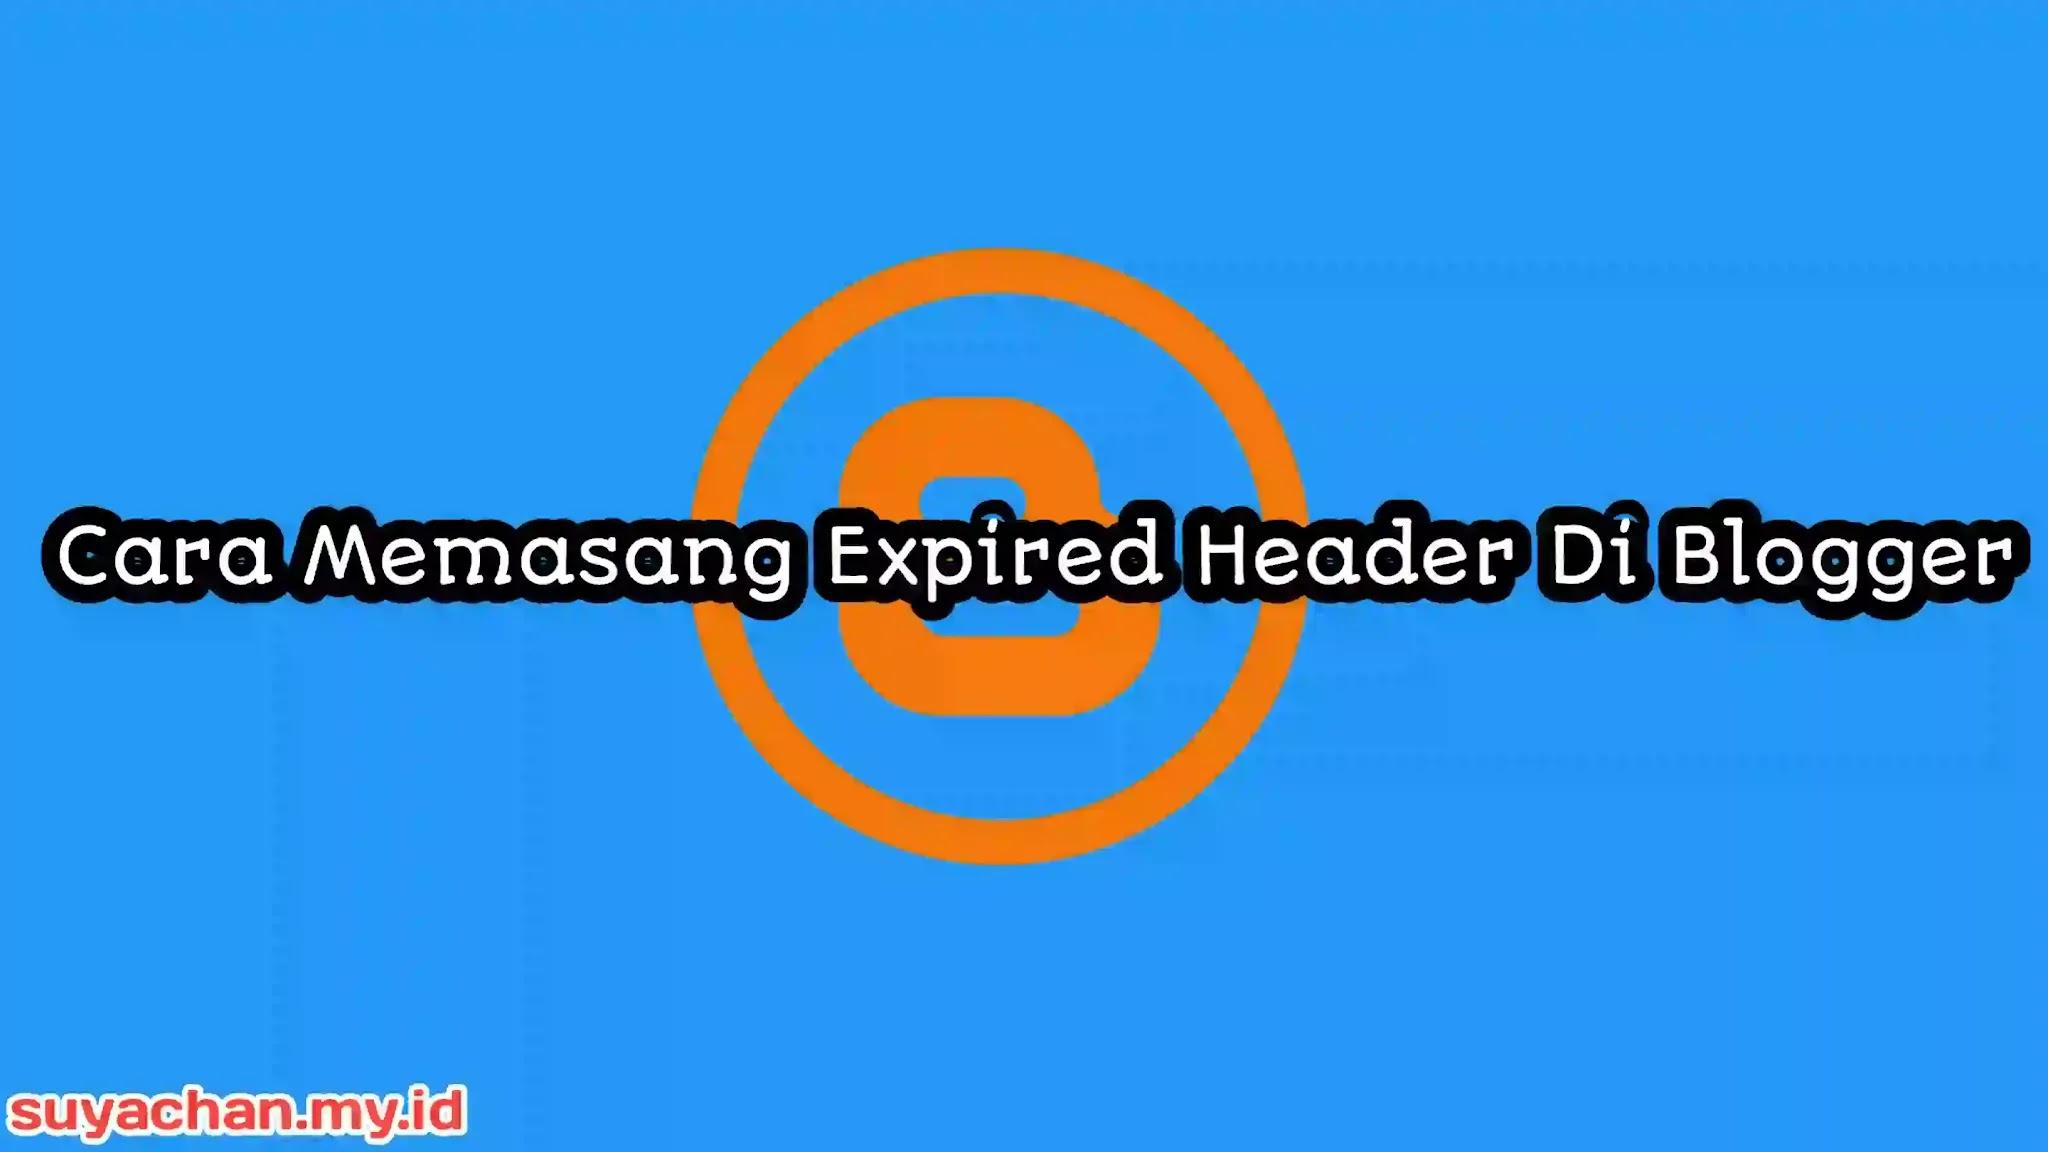 Cara Memasang Expired Header Di Blogger